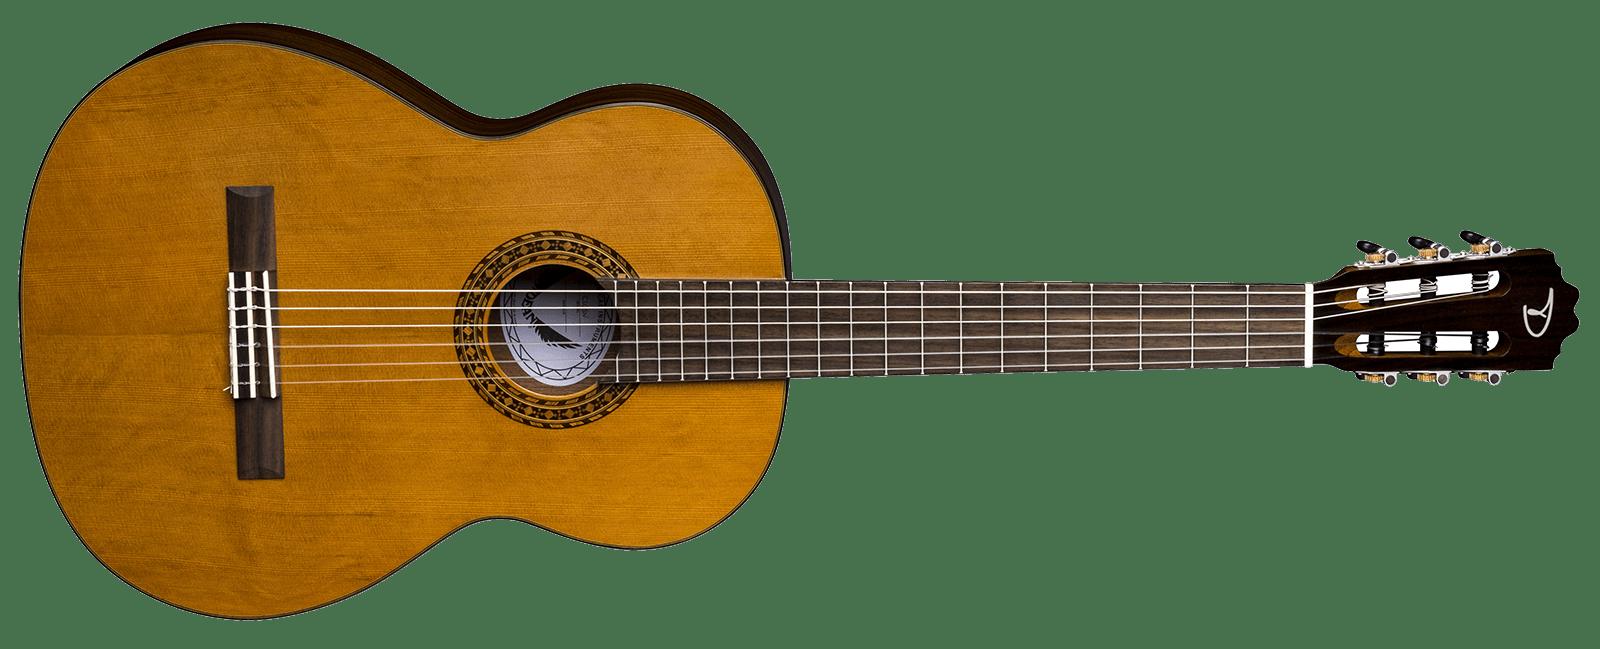 Espana Classical Solid Top Cedar SN